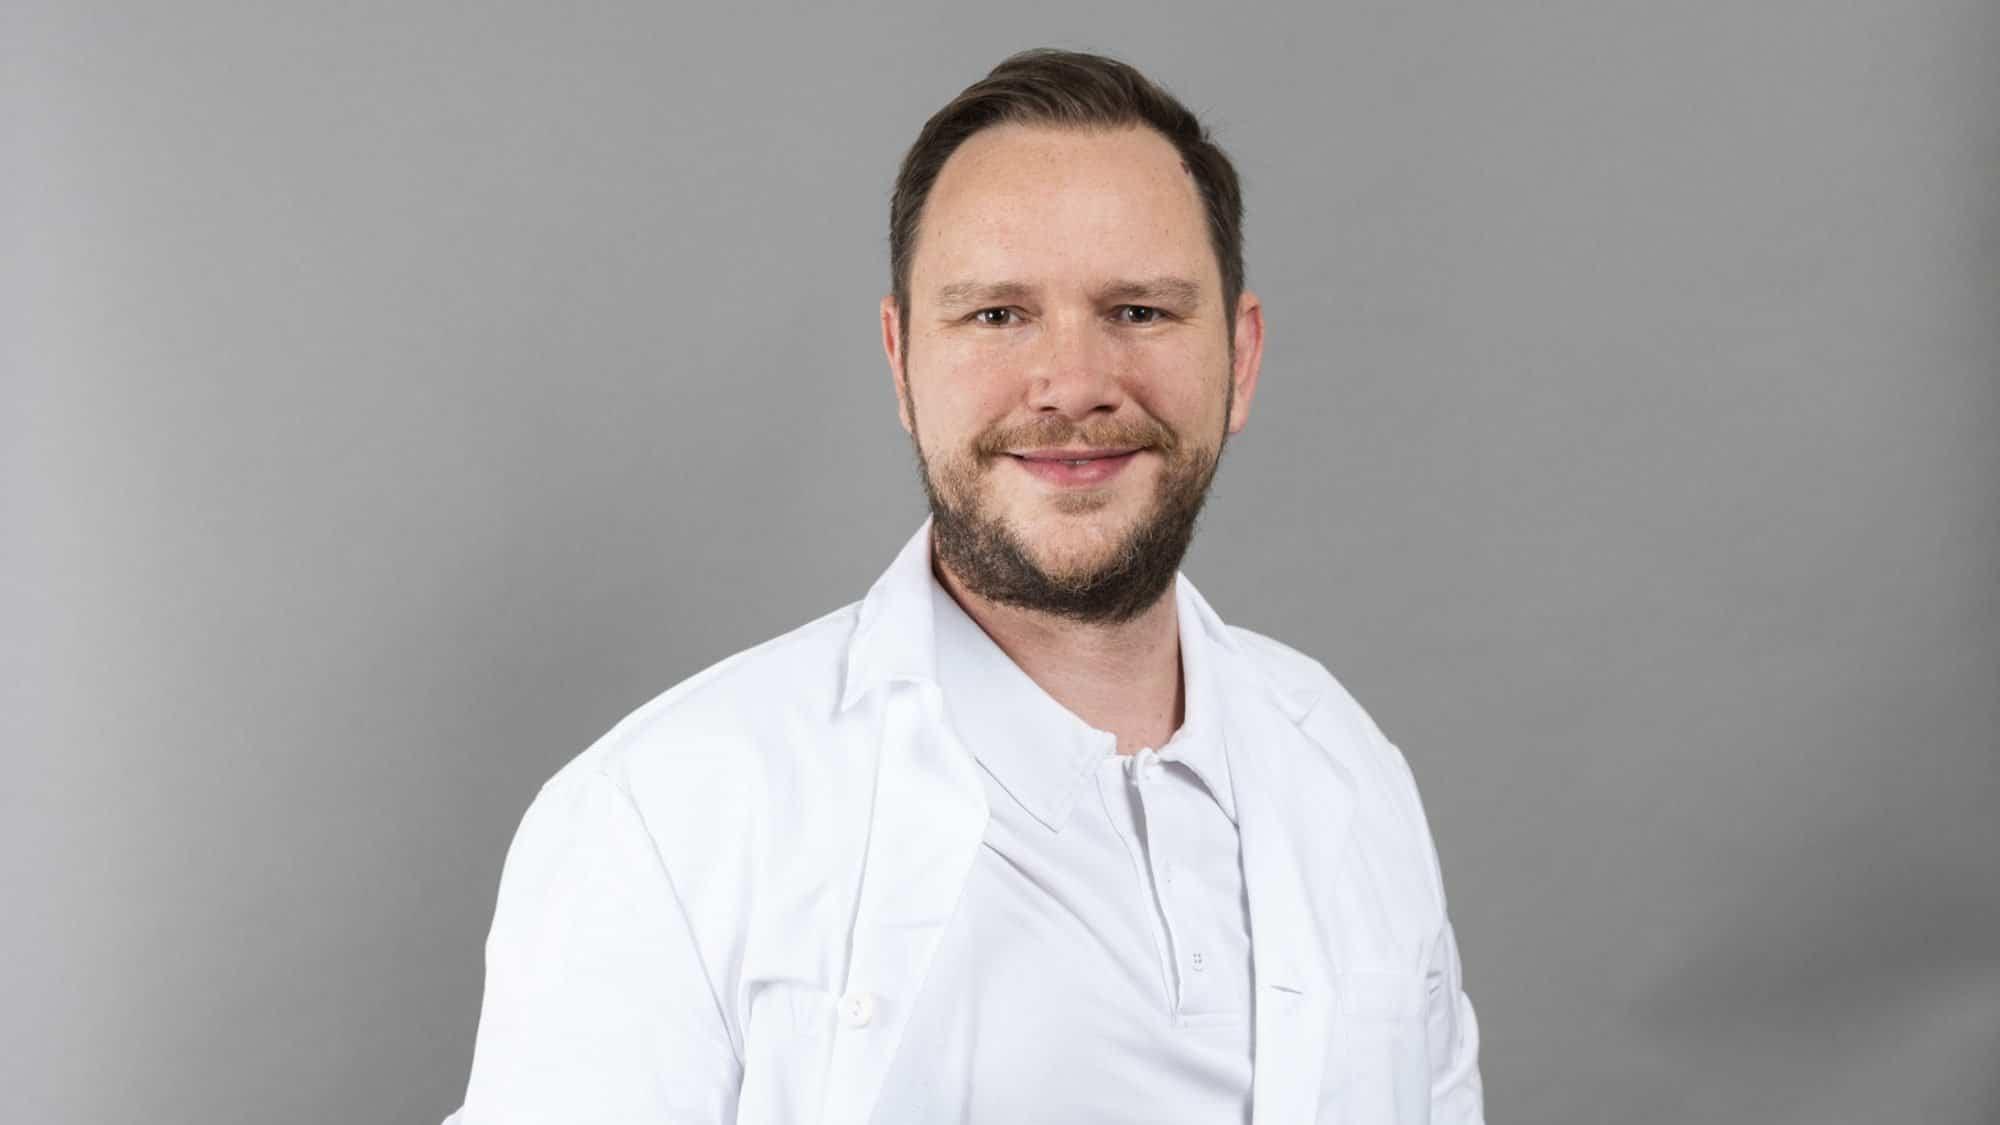 Dr. Sebastian Soppe, Chirurg und Hernienexperte am KSB.